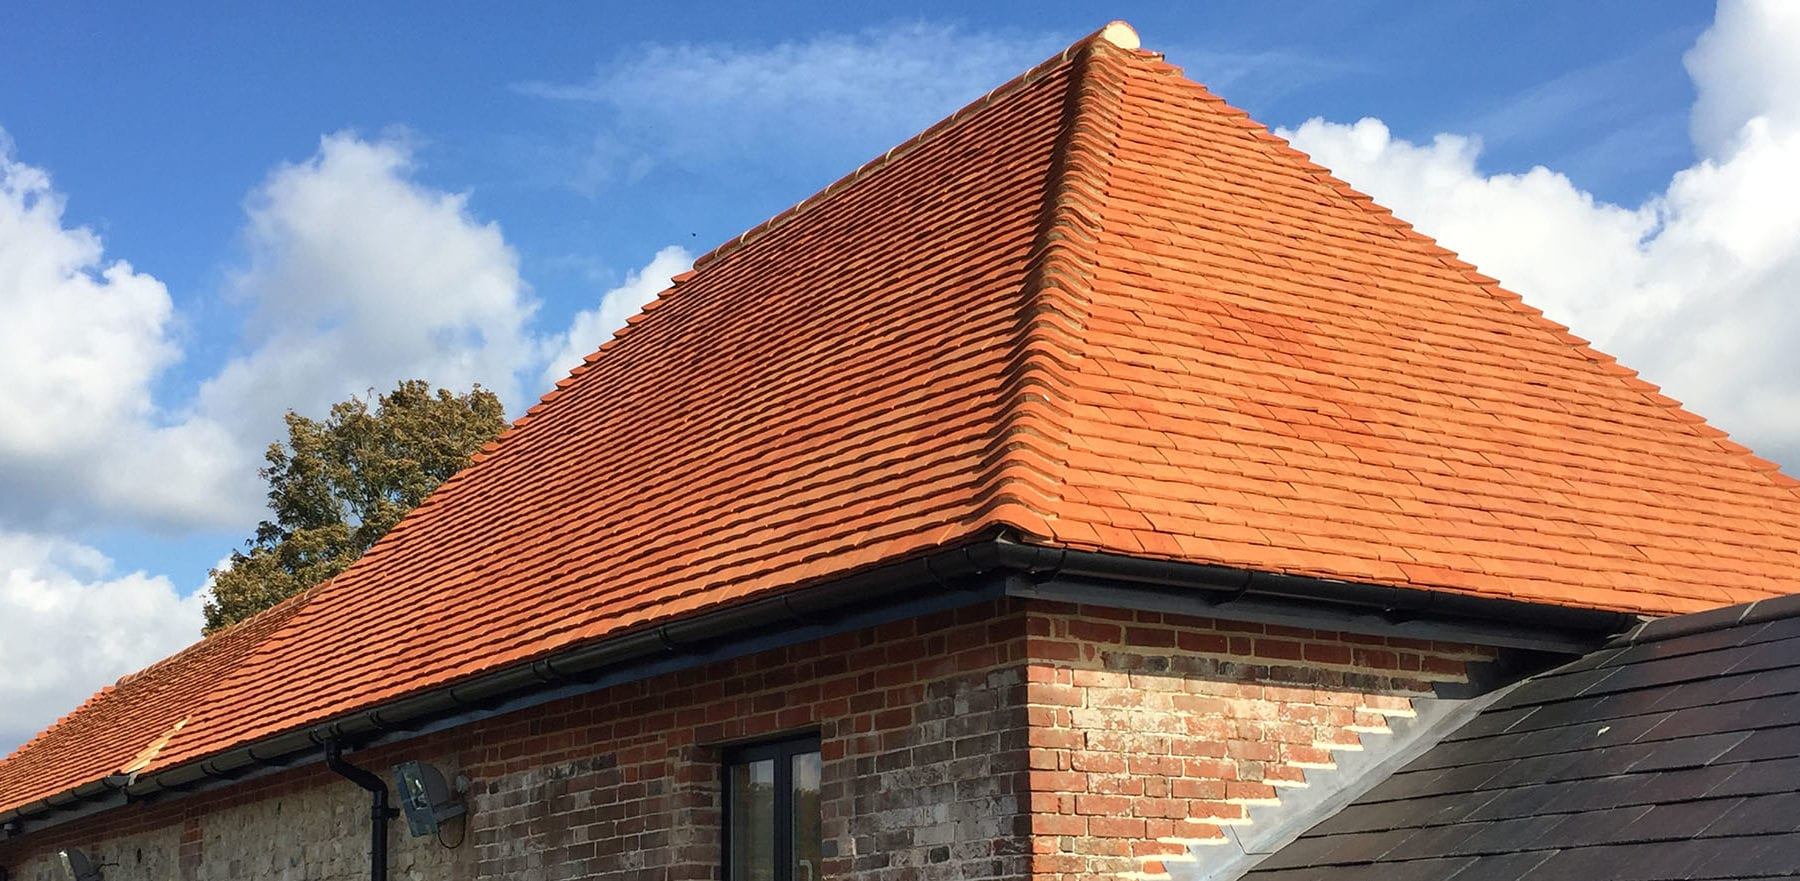 Lifestiles - Handcrafted Pentlow Clay Roof Tiles - Petersfield, England 7